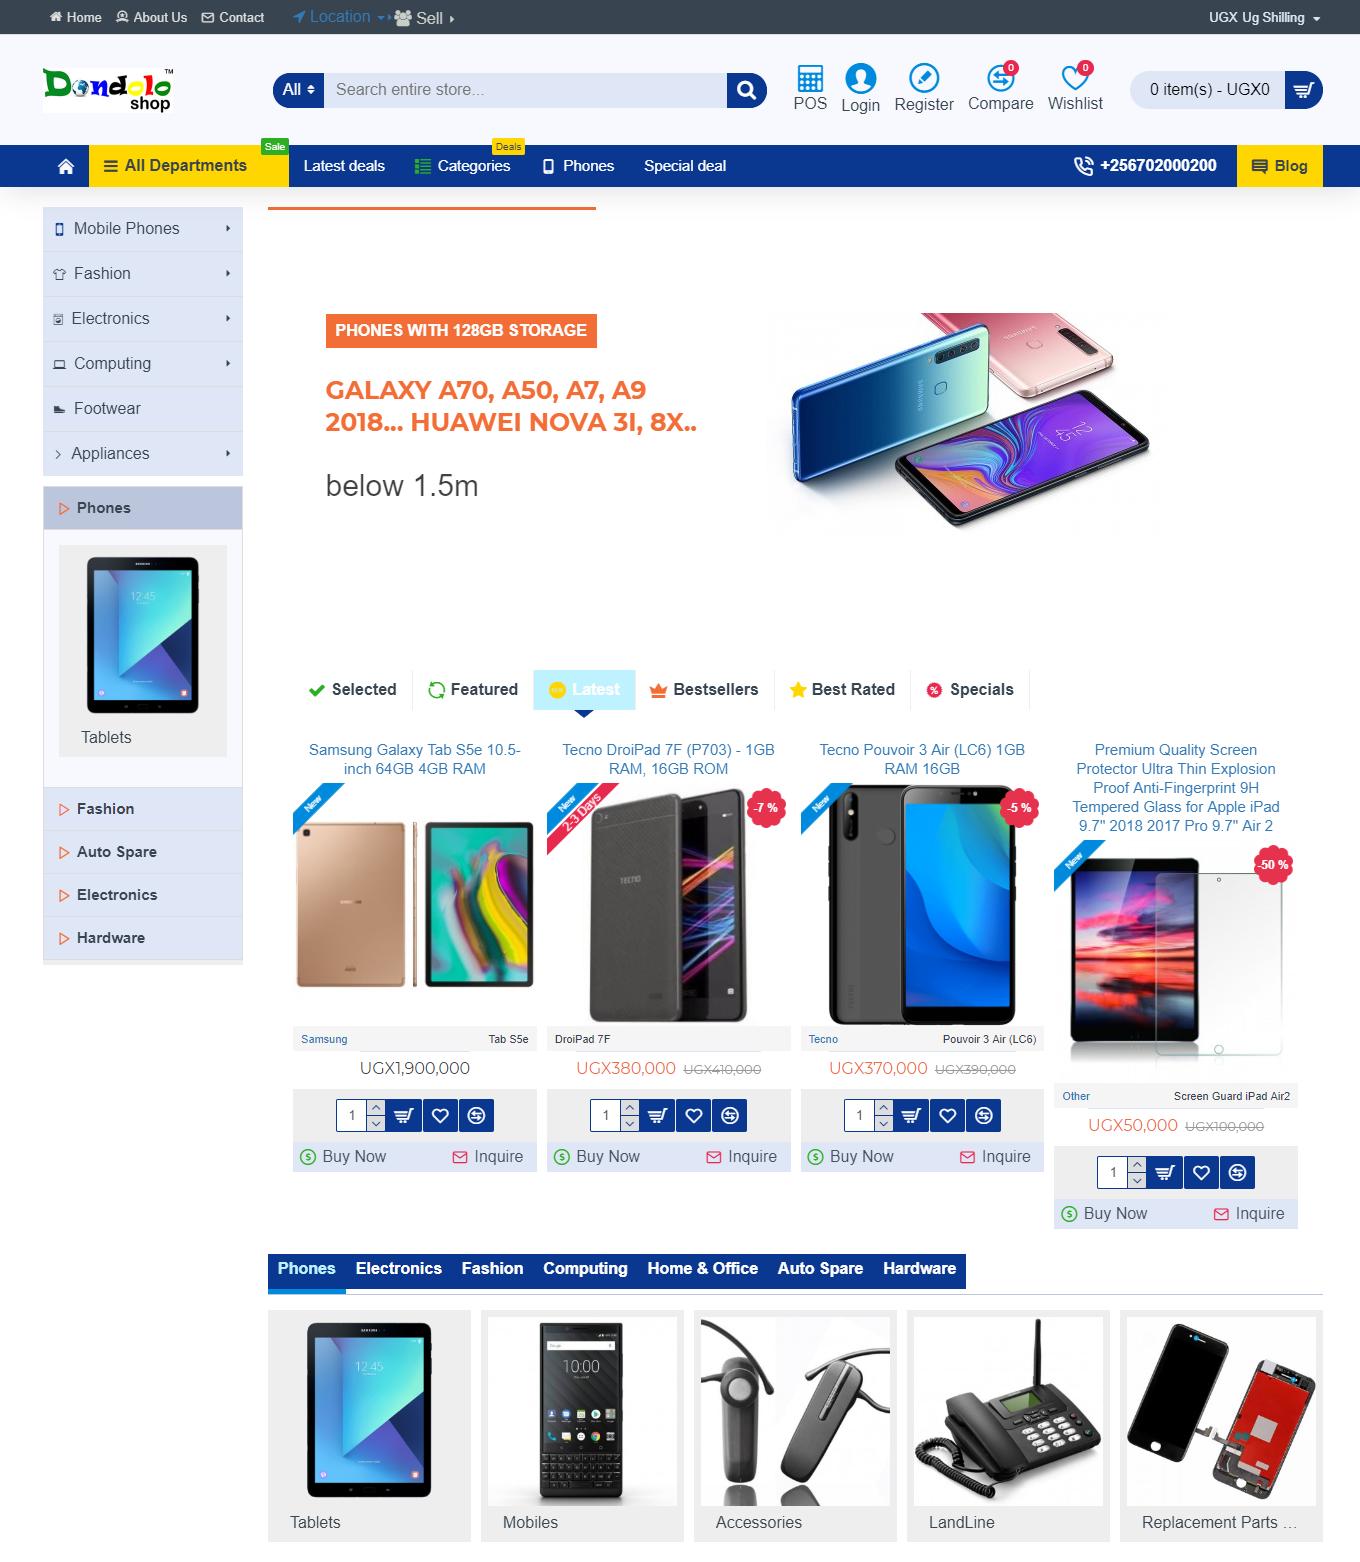 Dondolo Shop - Website